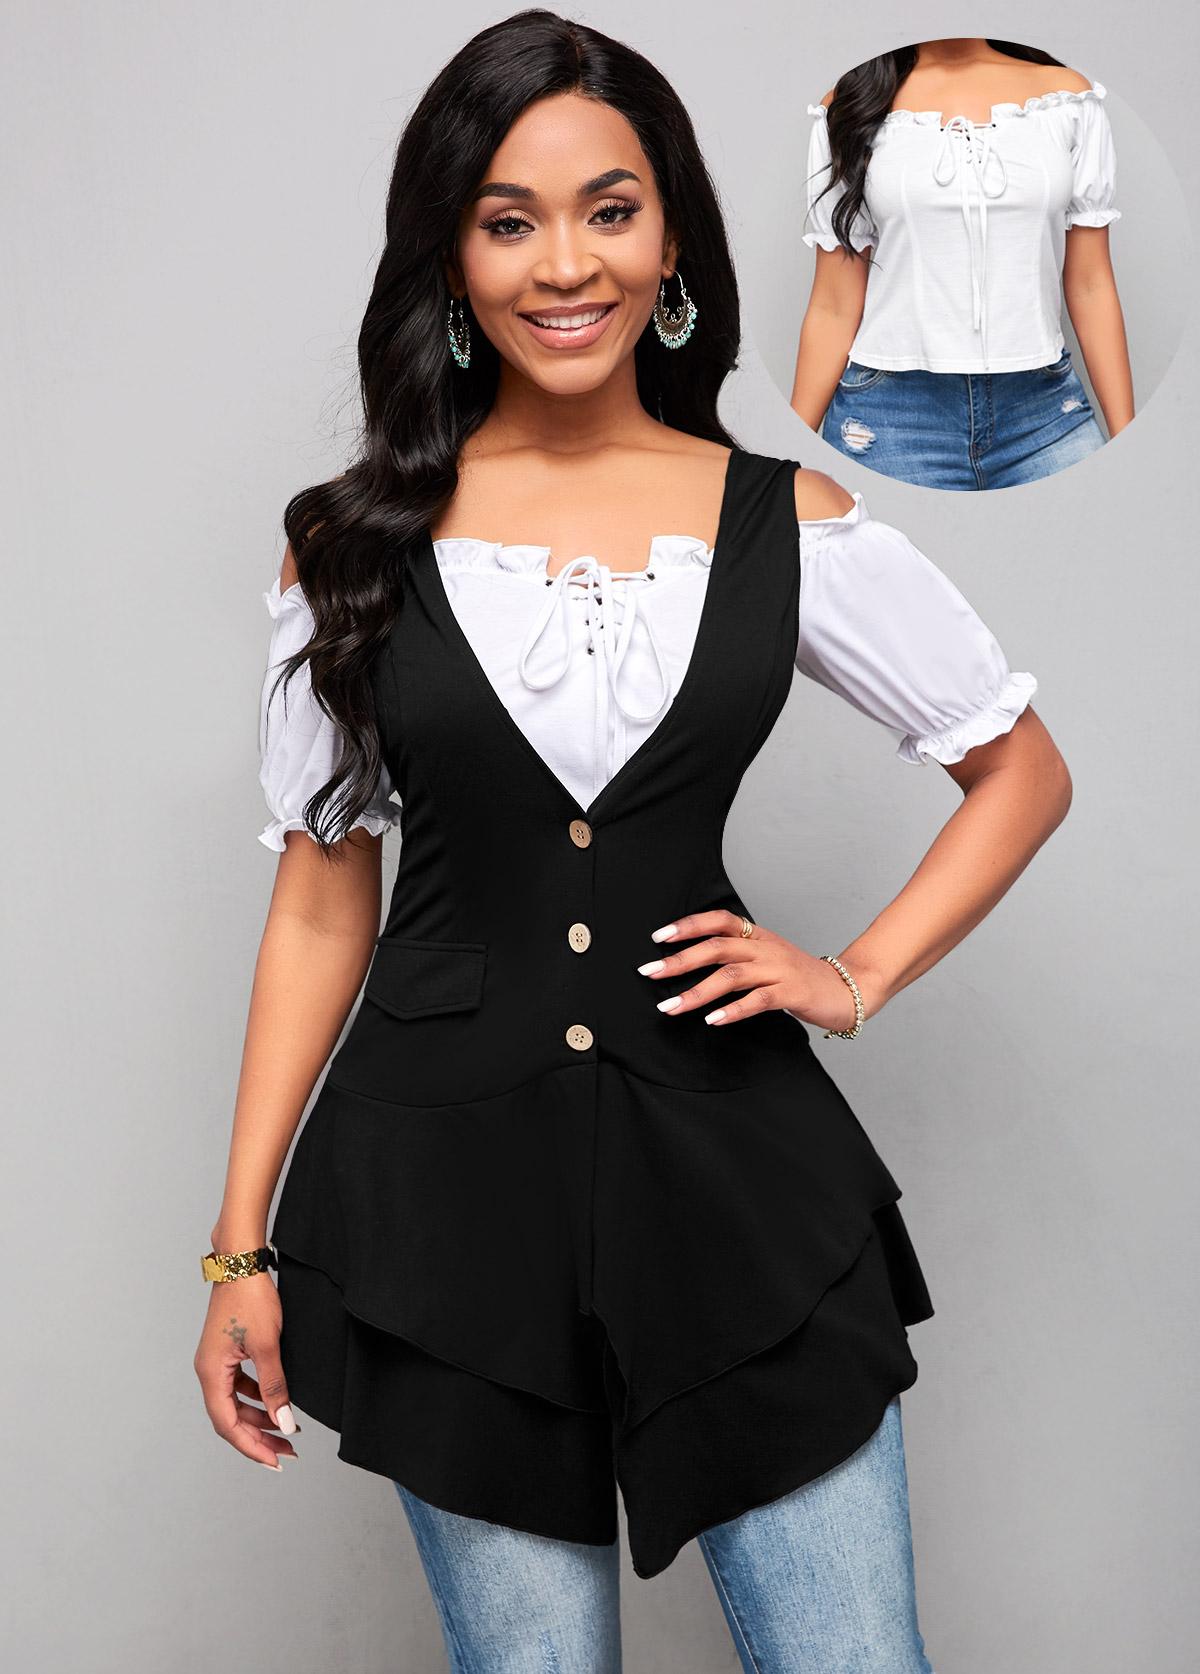 ROTITA White Lace Up Blouse and Black Asymmetric Hem Waistcoat